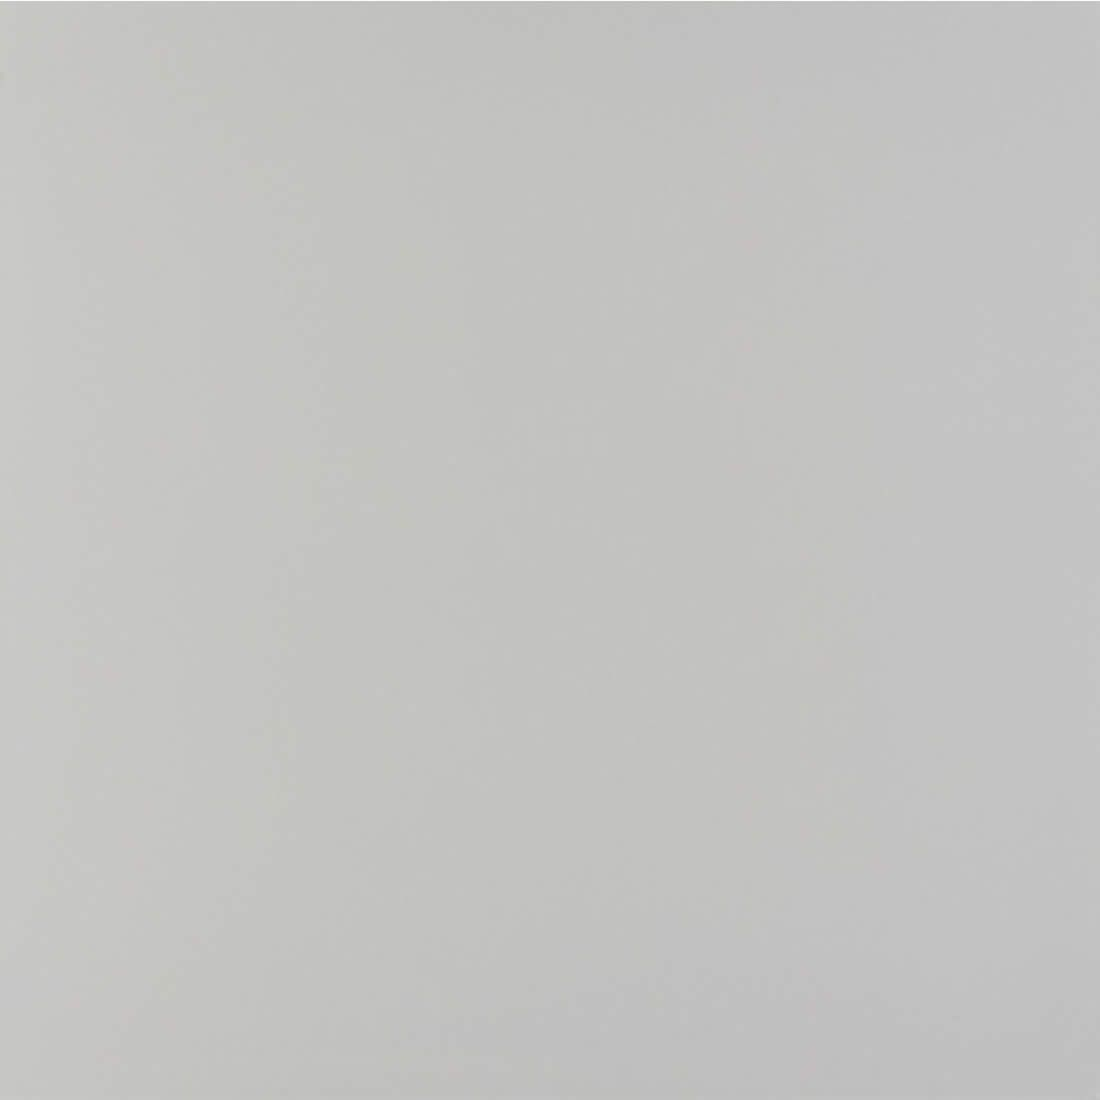 Porcelanato Elizabeth Smoke 101 x 101 HD Polido Ref 01040002001180